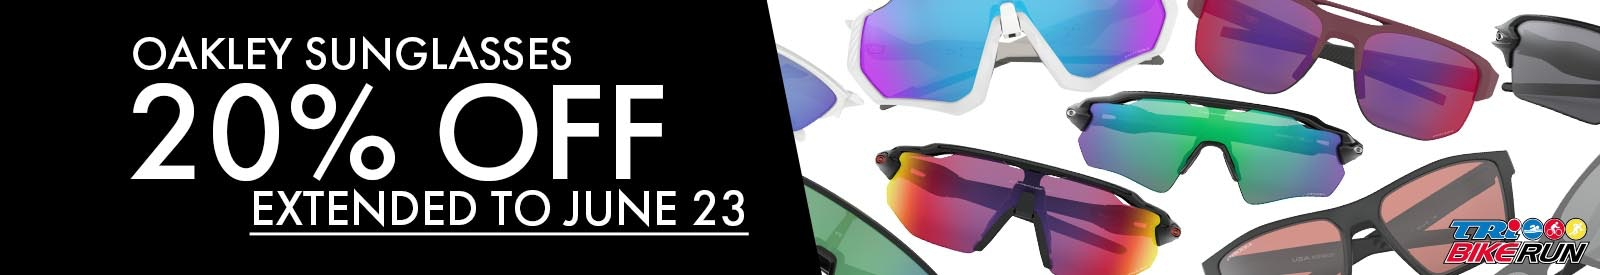 sunglasses sale 20% off till june 16 tri bike run